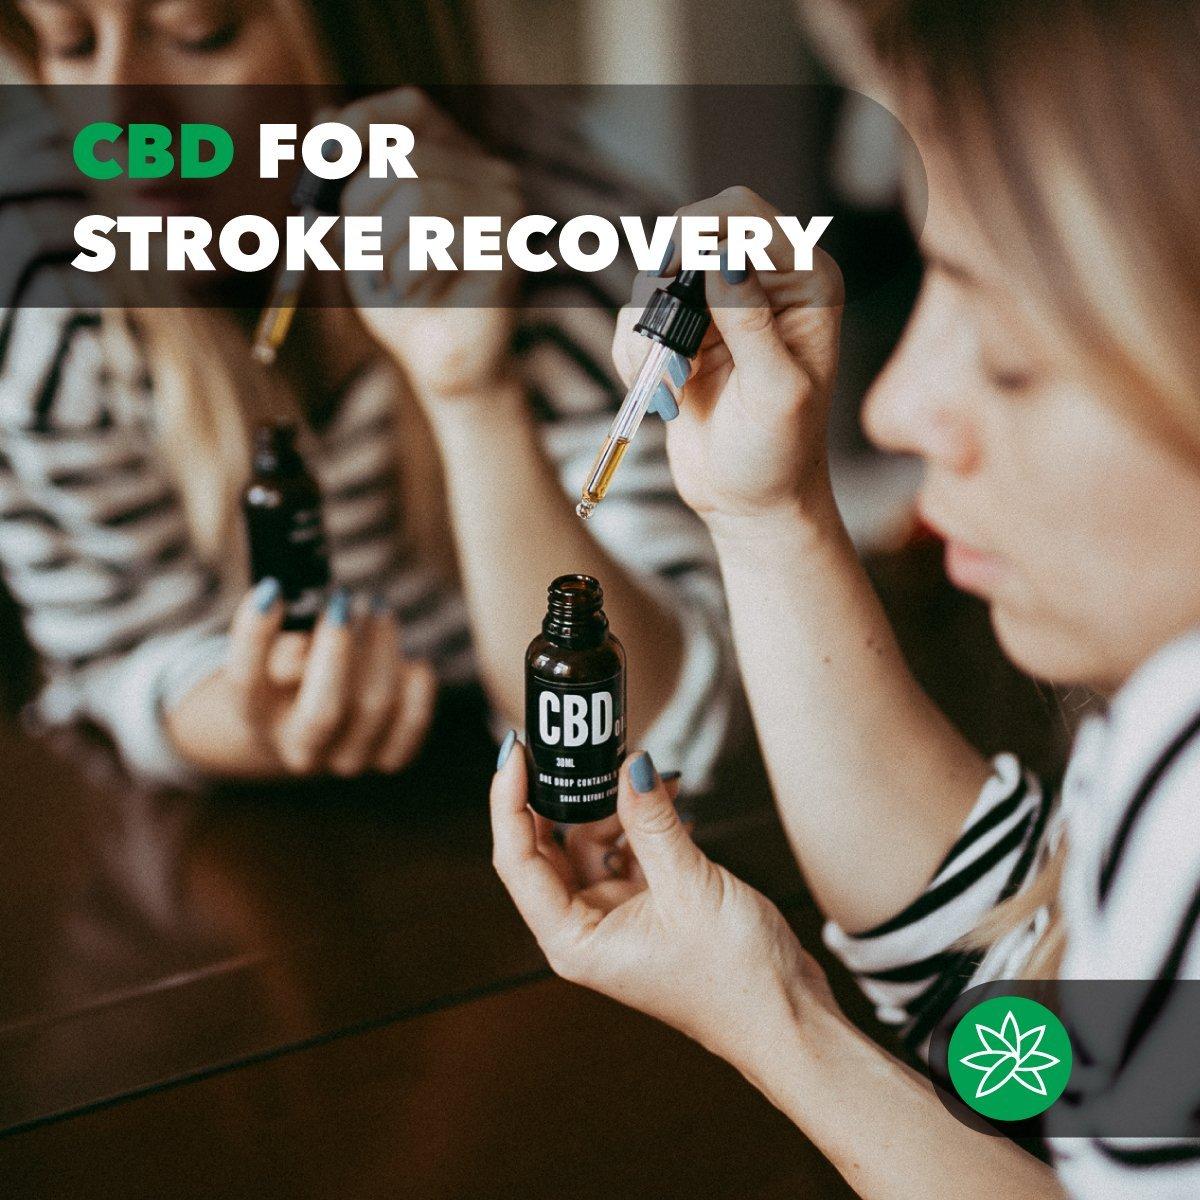 CBD for stroke recovery